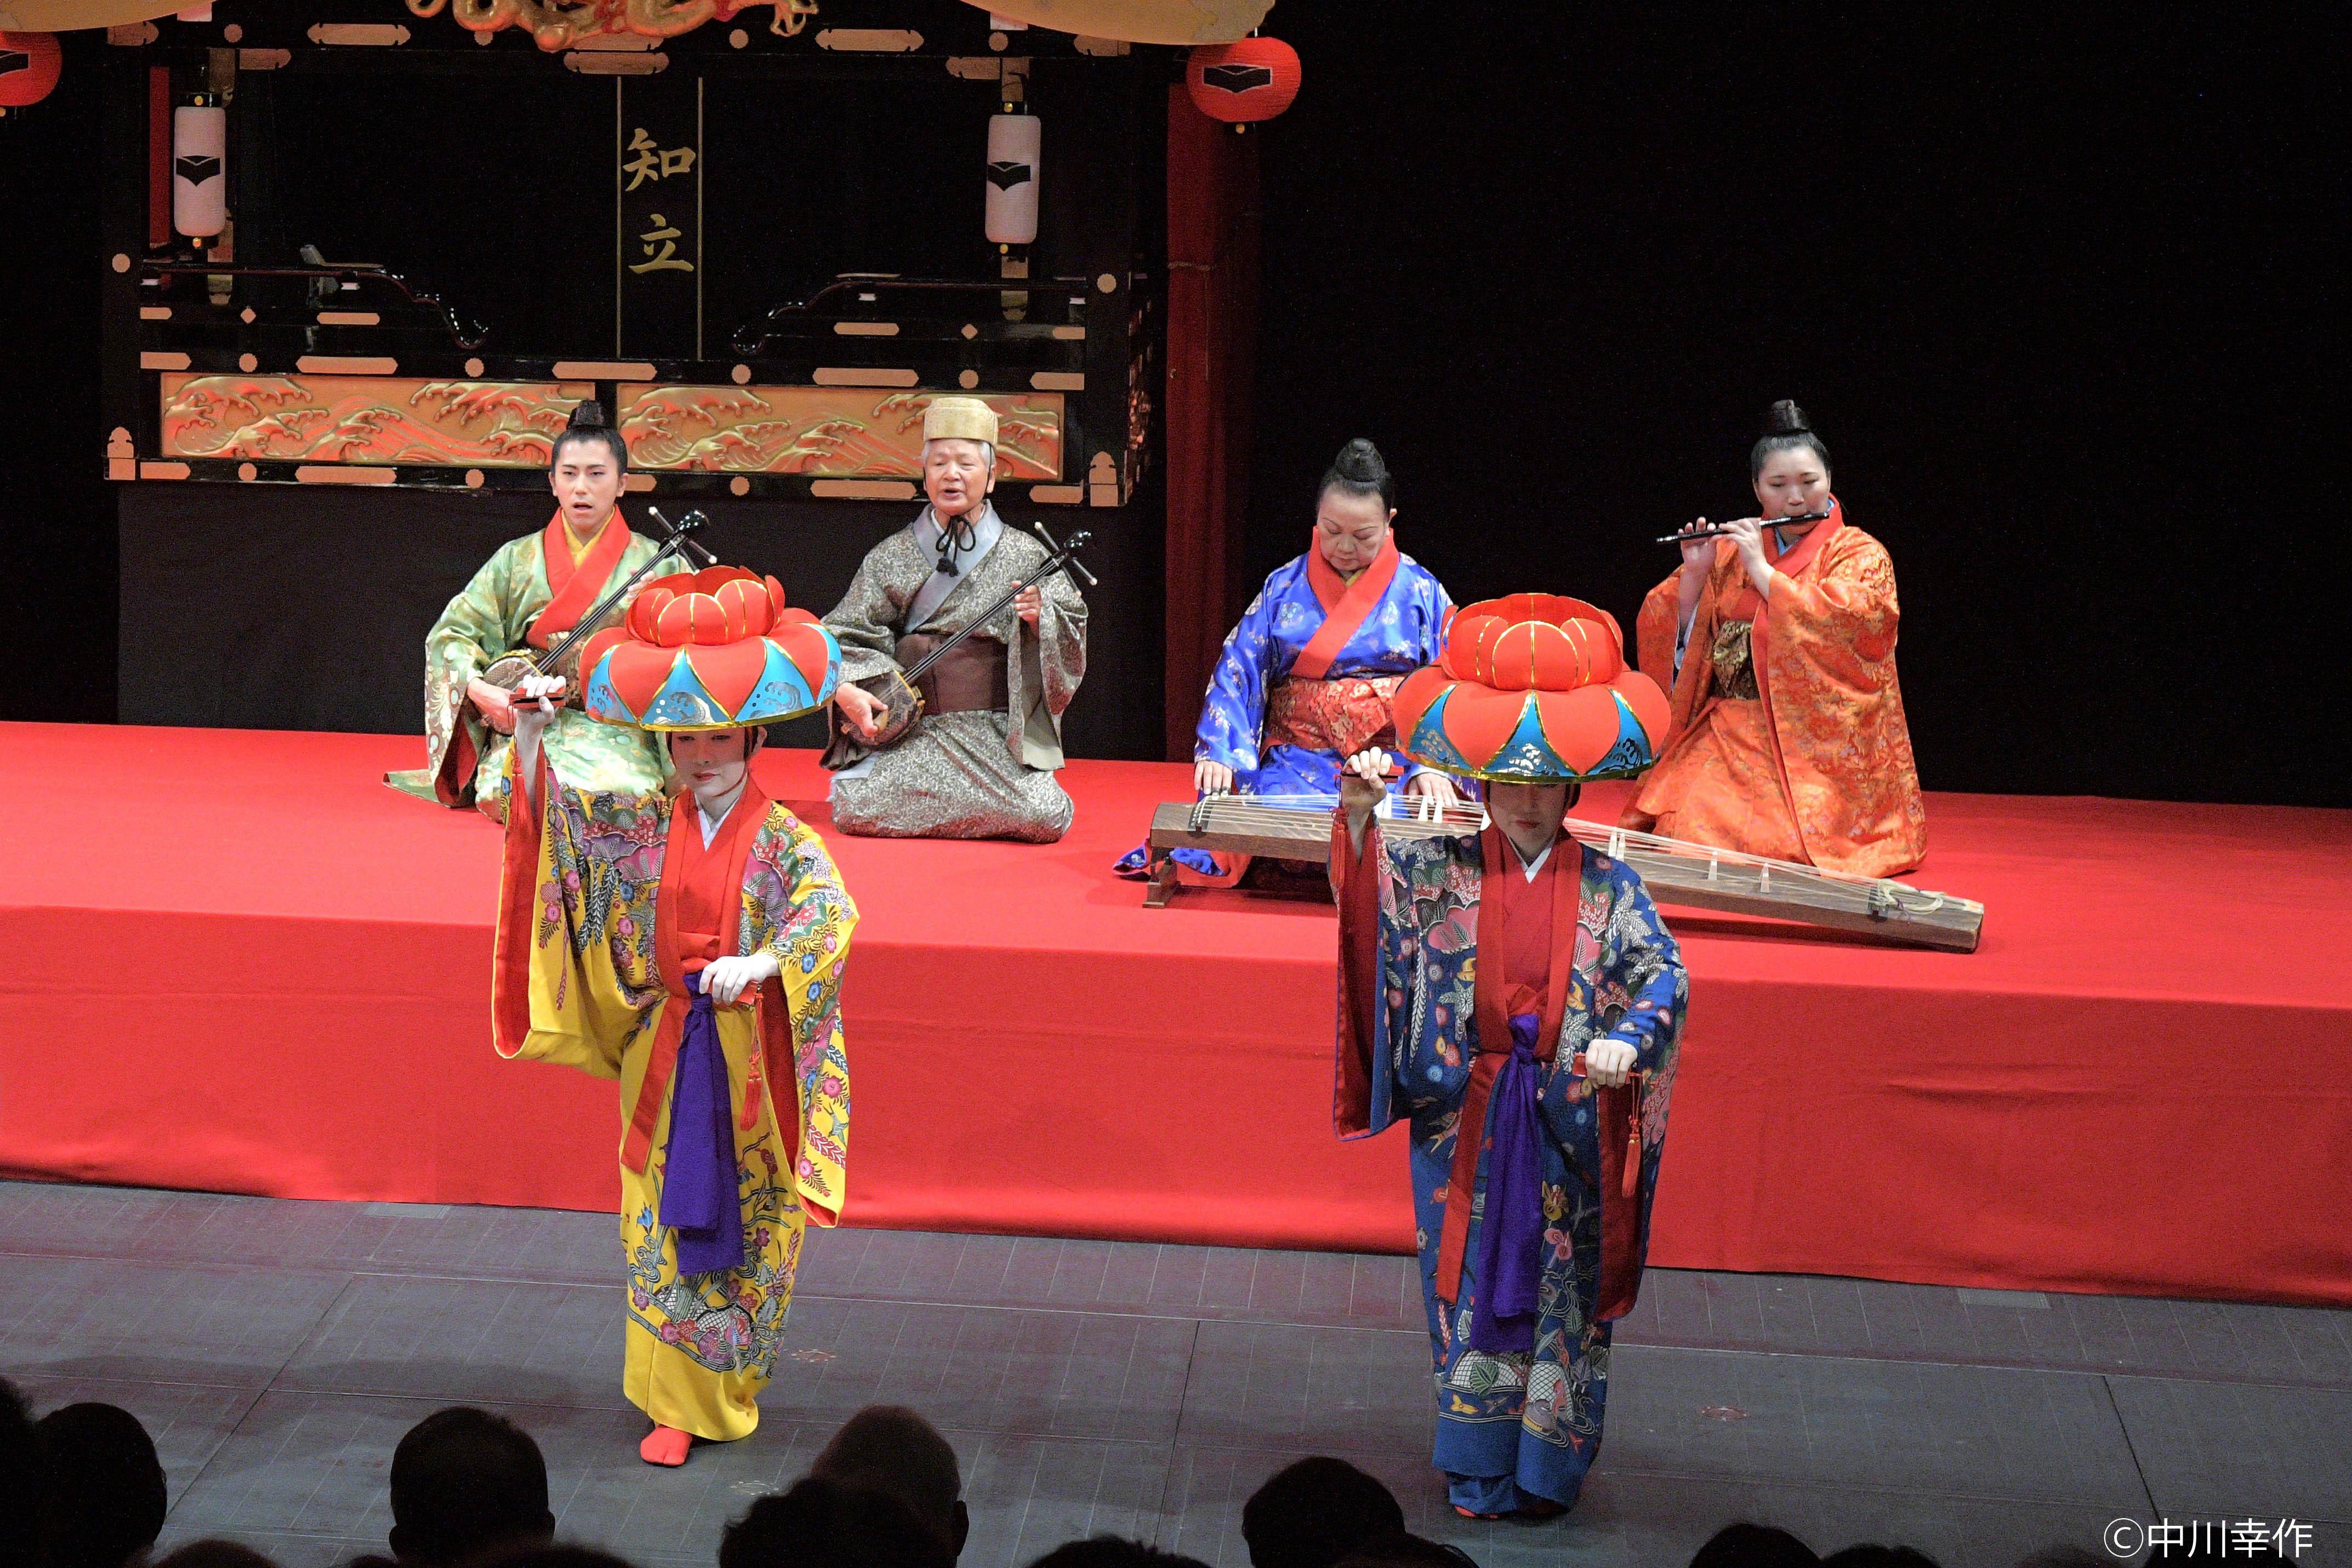 p2追加 関連講座(琉球舞踊)